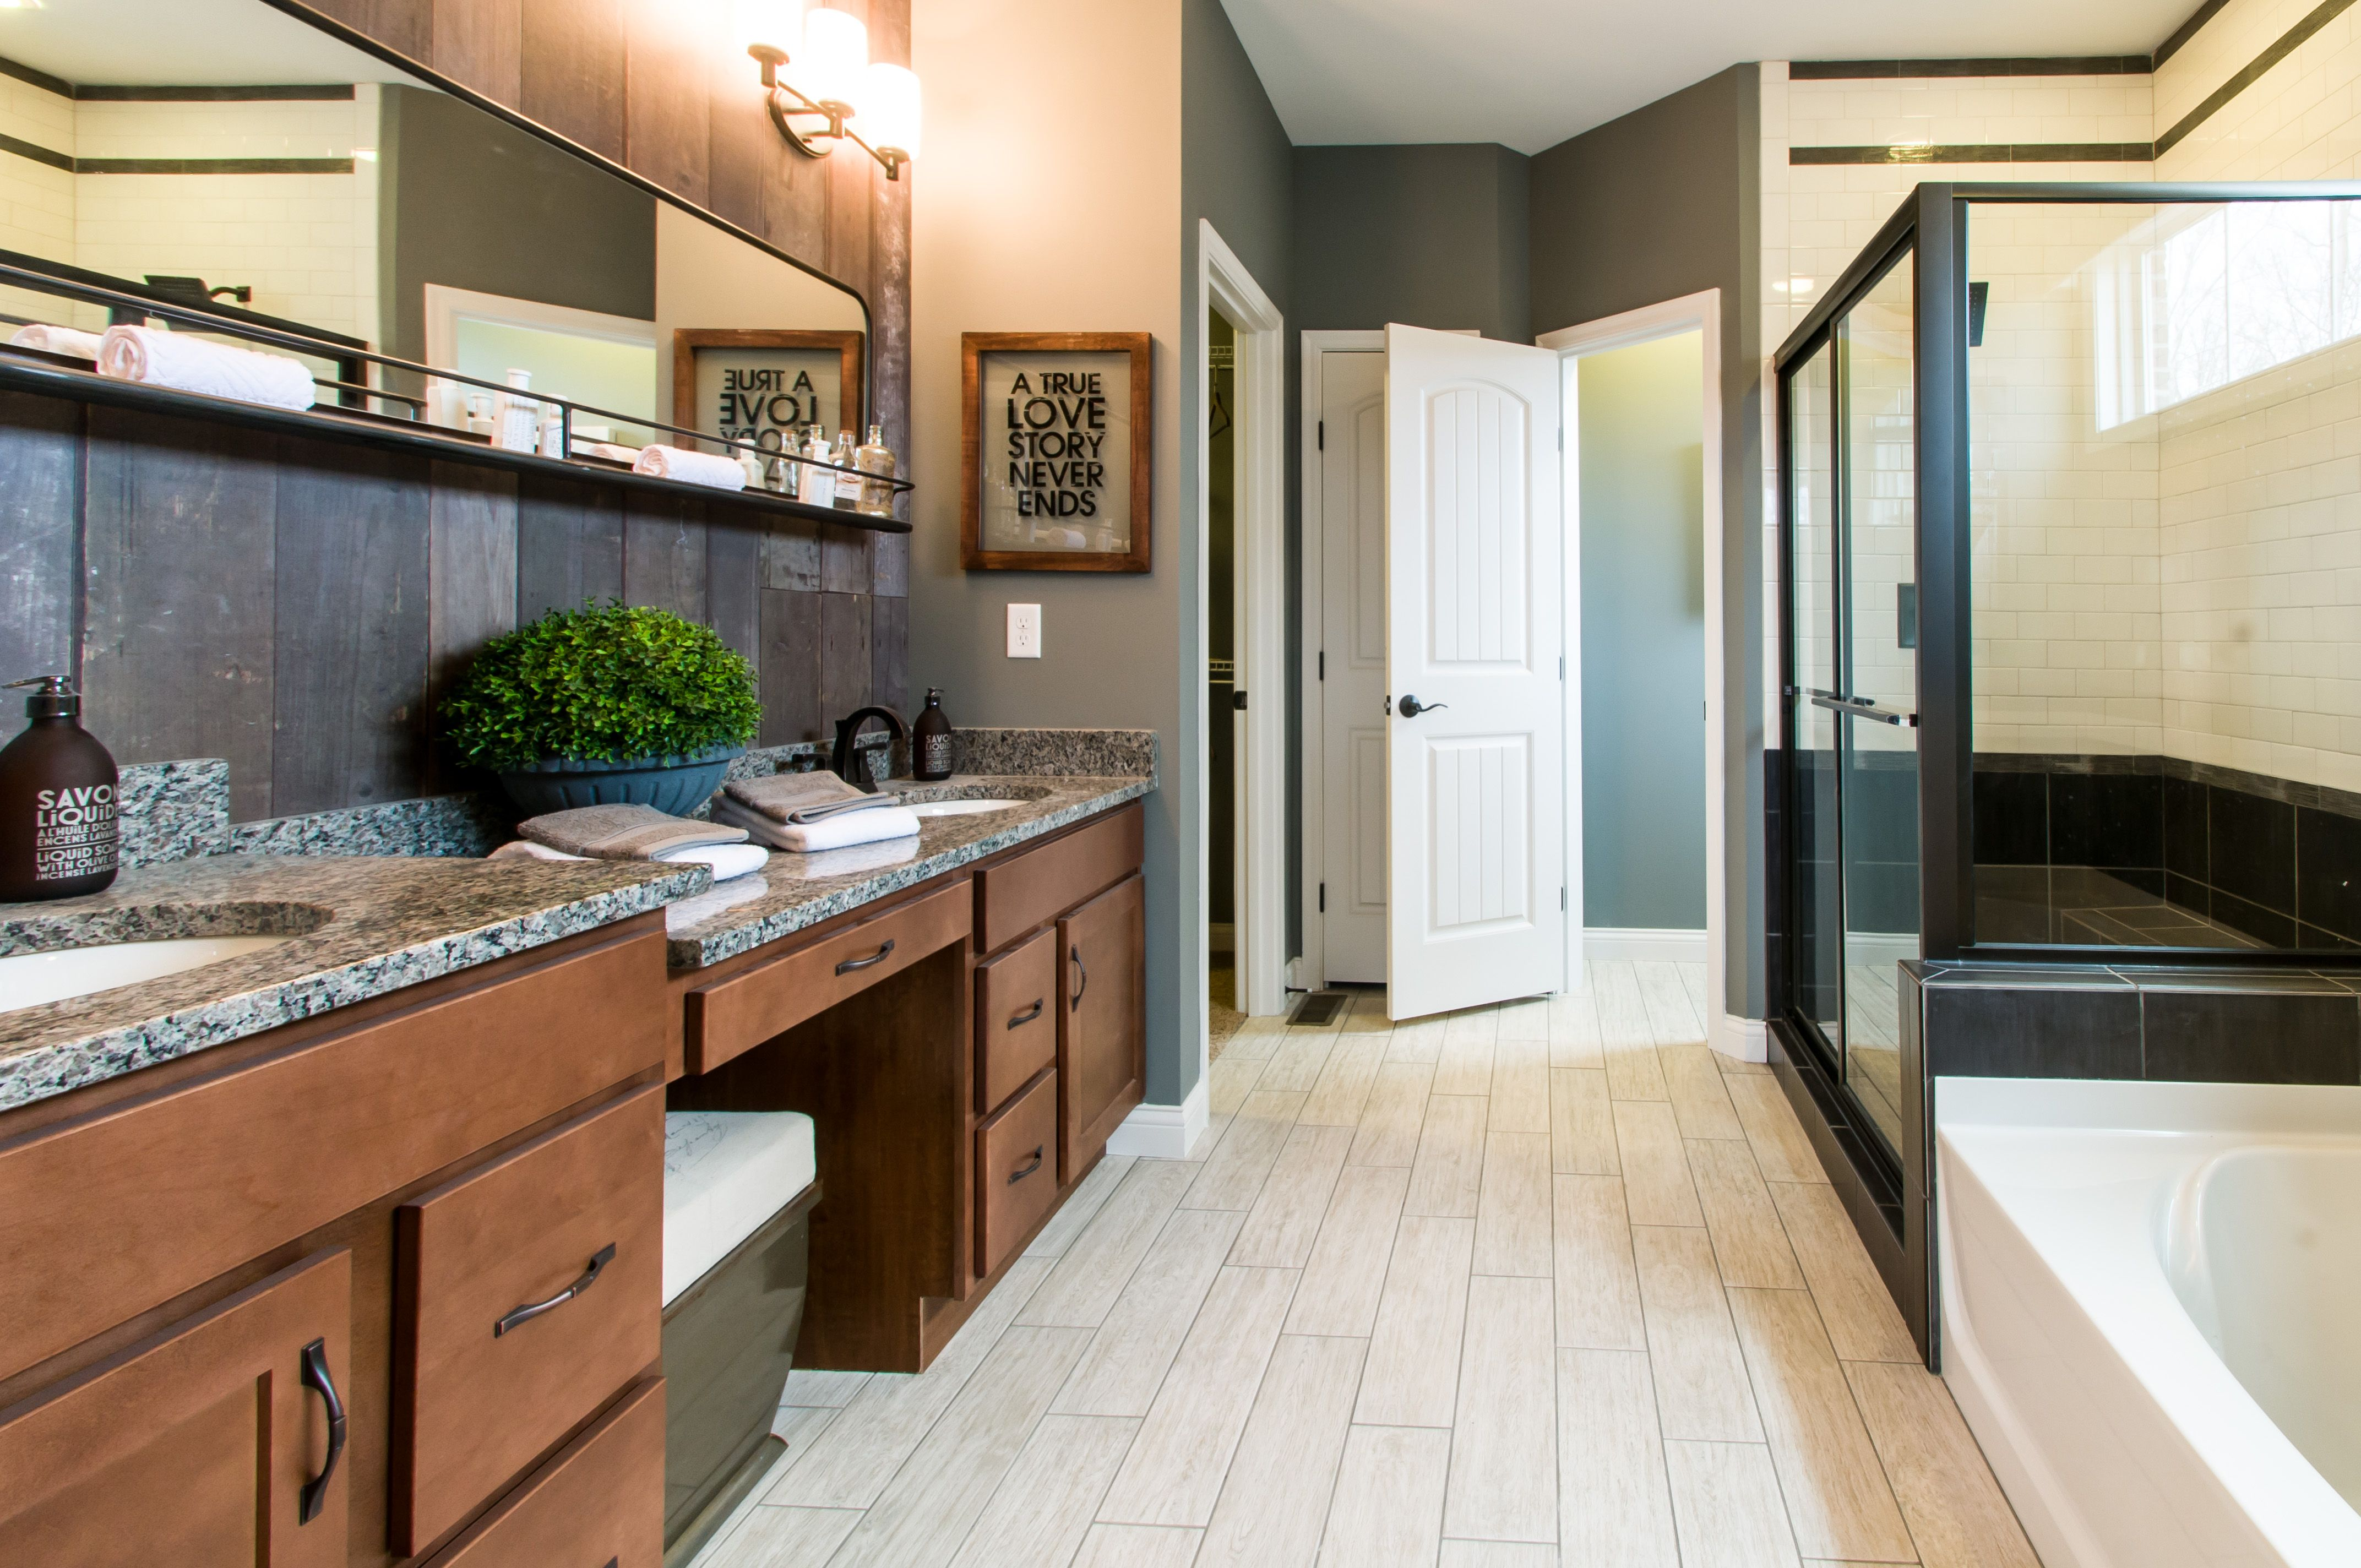 Bathroom featured in the Blake By Fischer Homes  in Cincinnati, KY